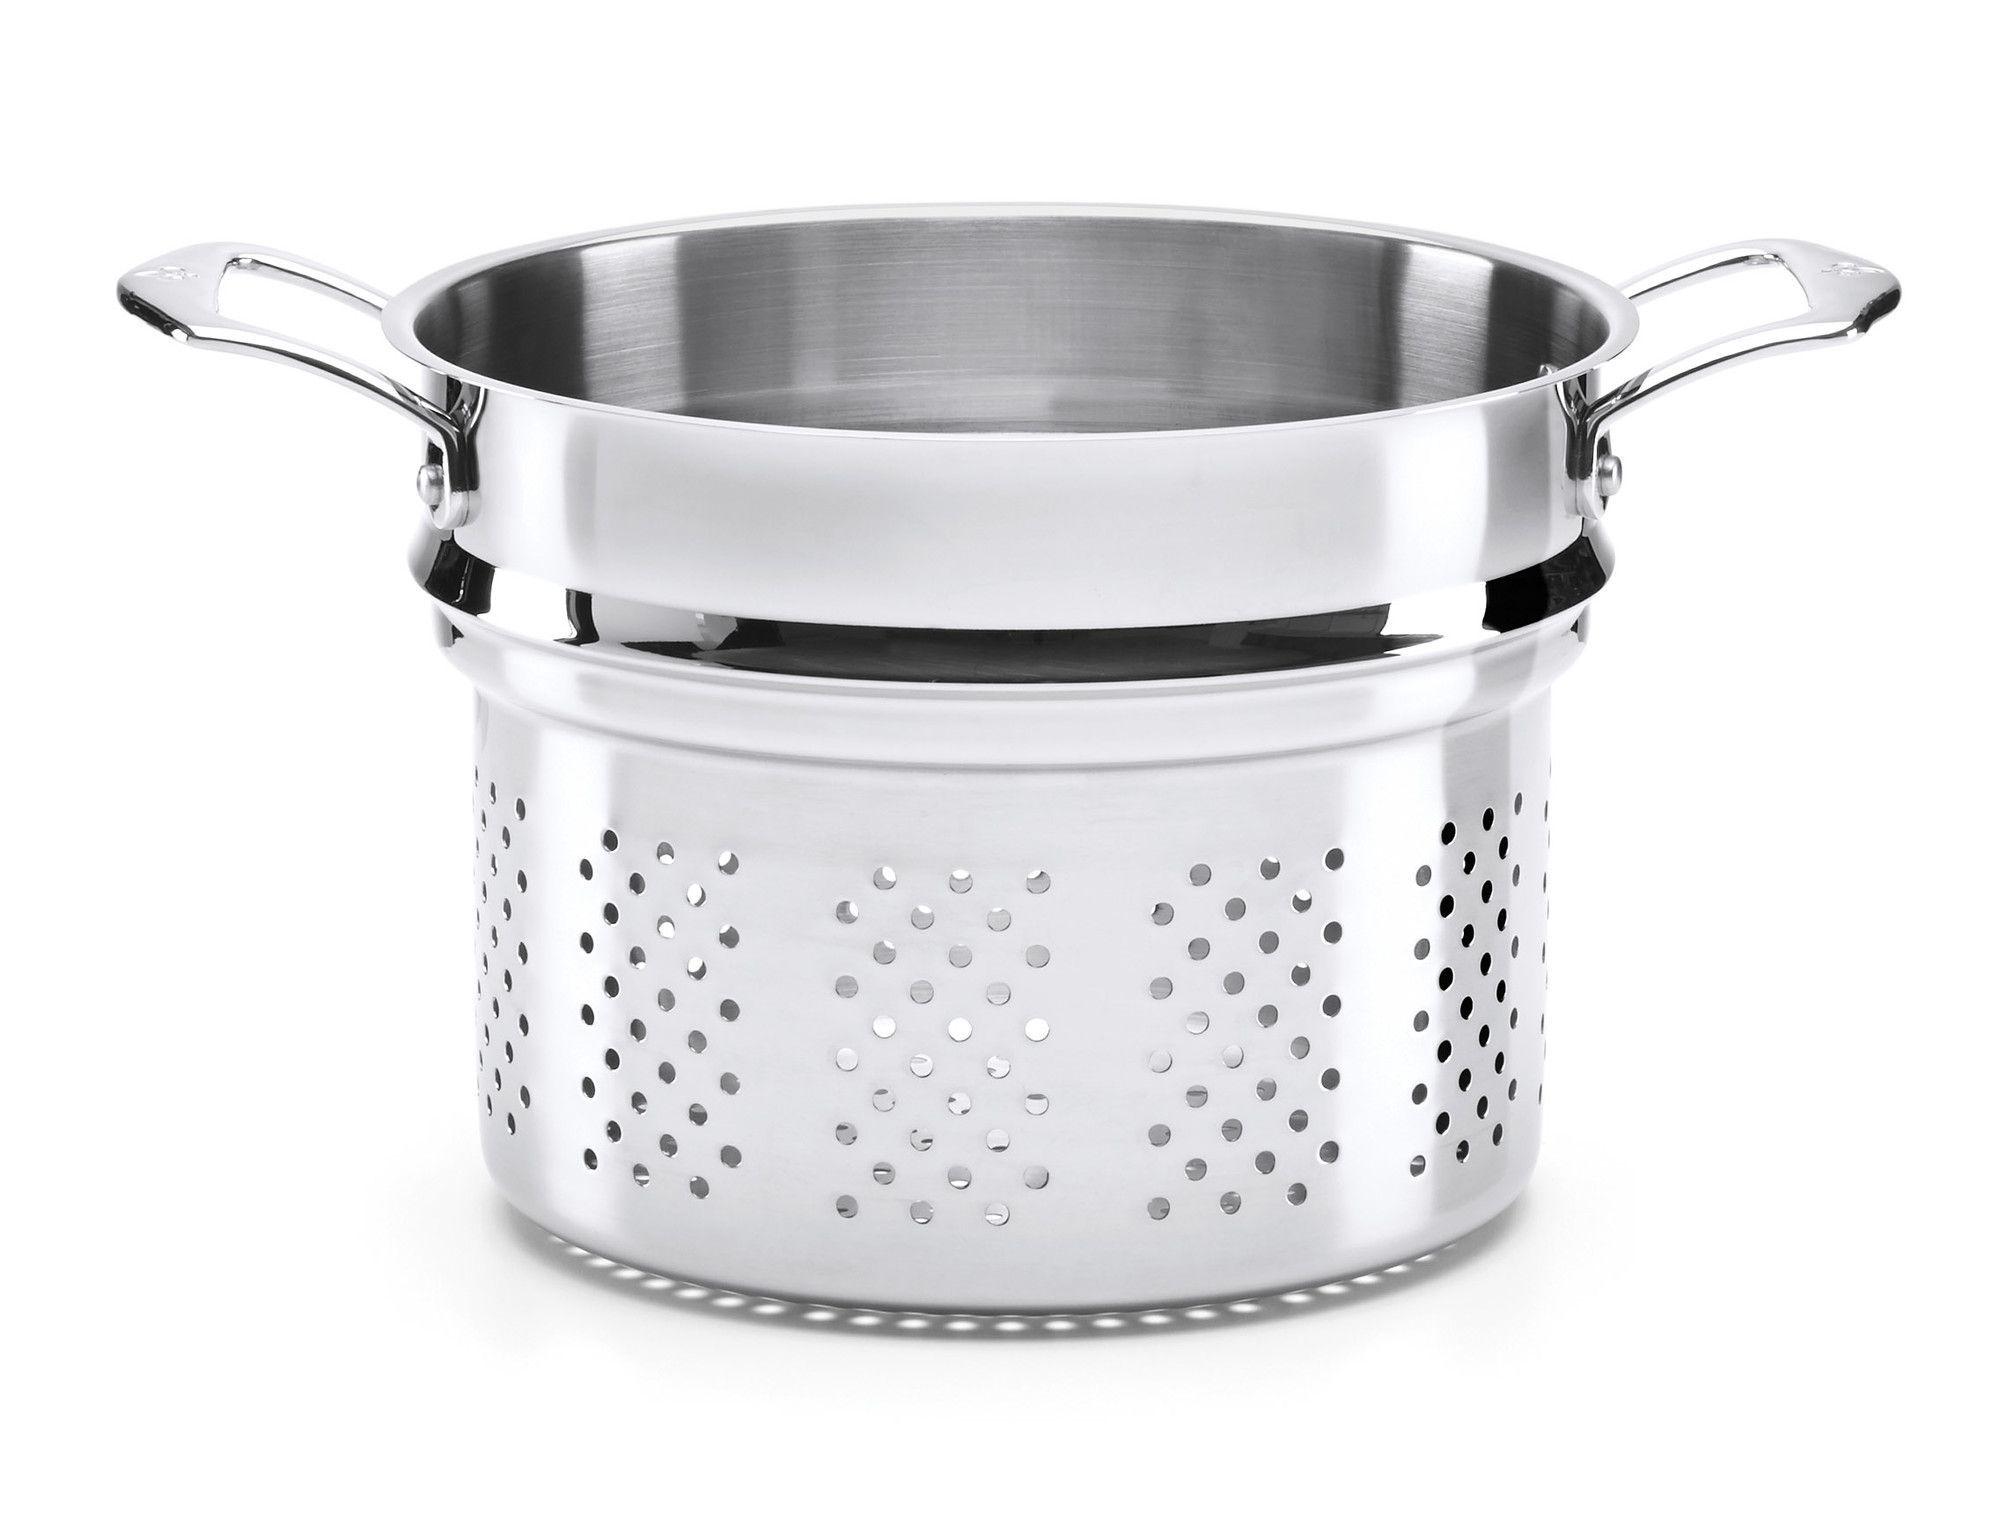 8quarts pastasteamer insert cookware set steamer